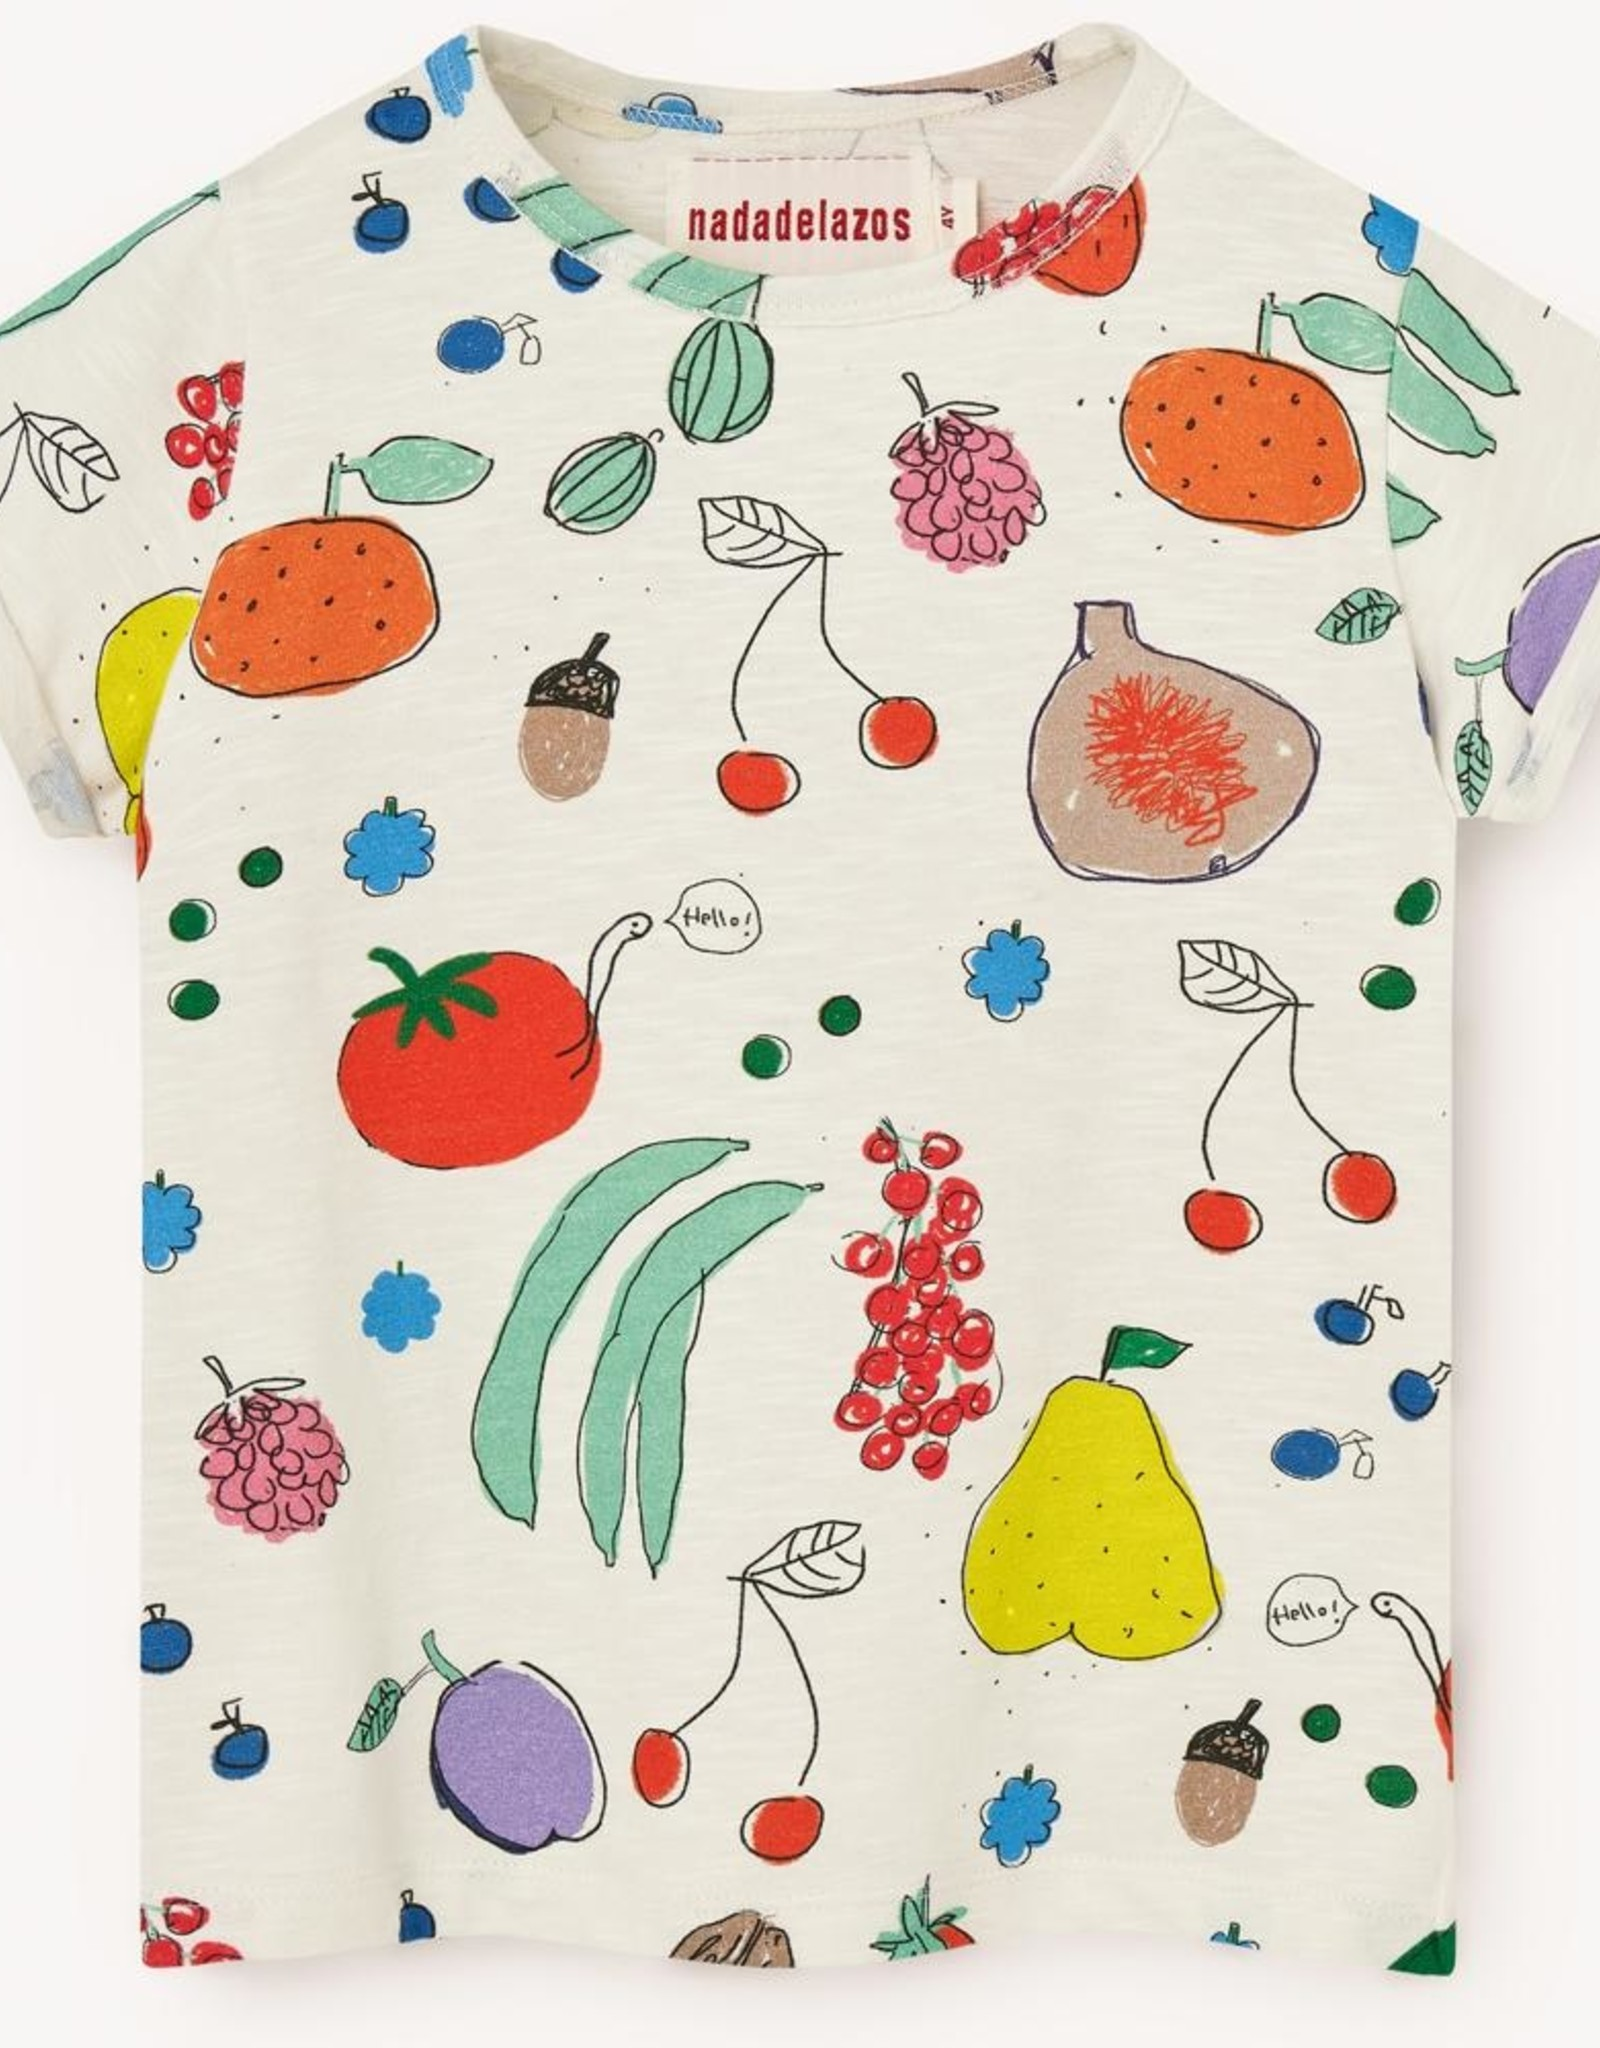 Nadadelazos Nadadelazos T-Shirt Fruits From The Garden